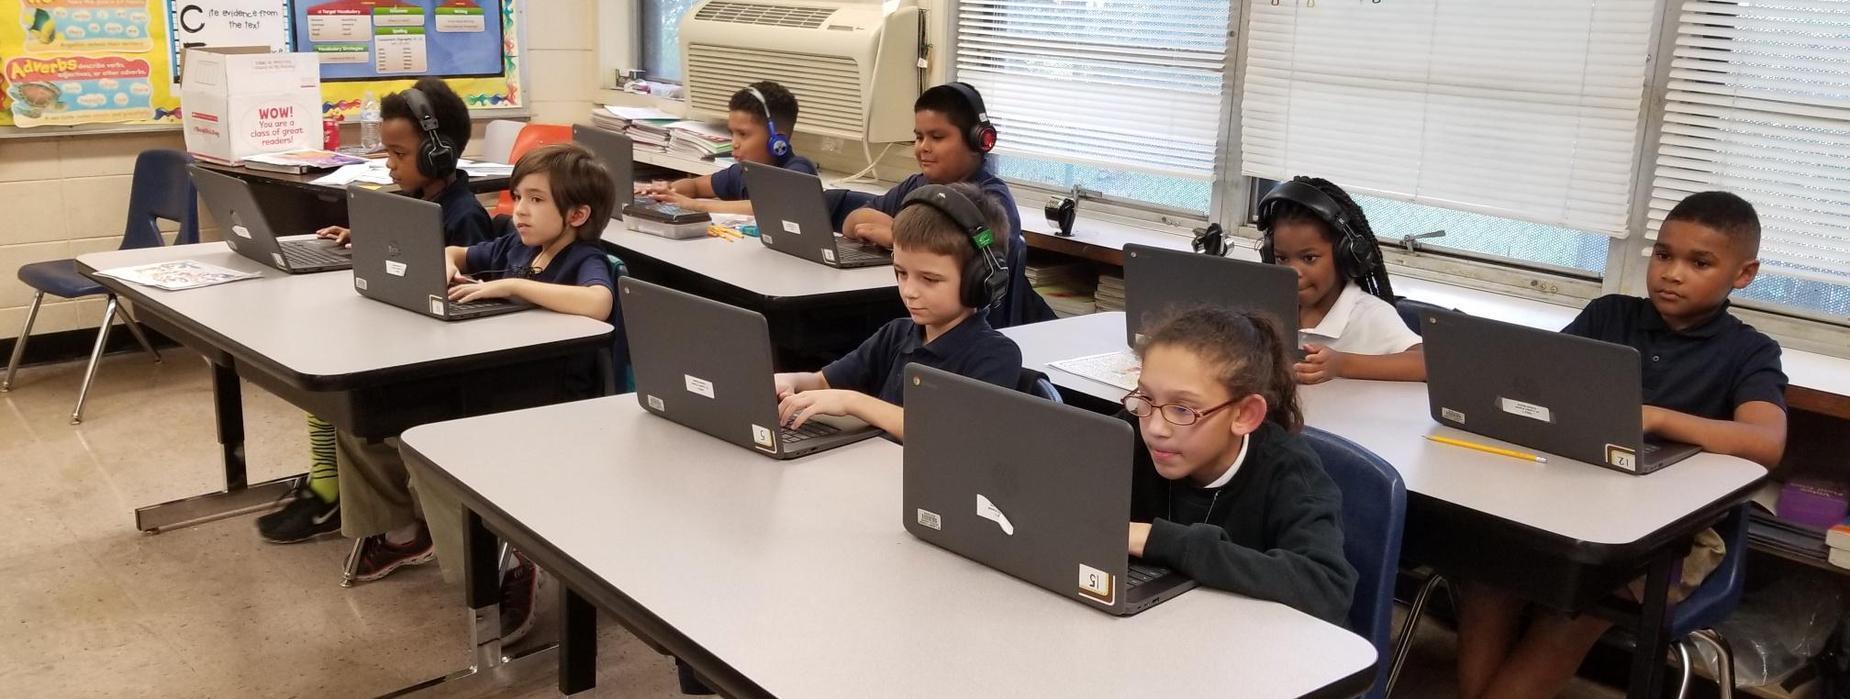 Mrs. Davis' Second Graders Enjoying Their New Classroom Tables